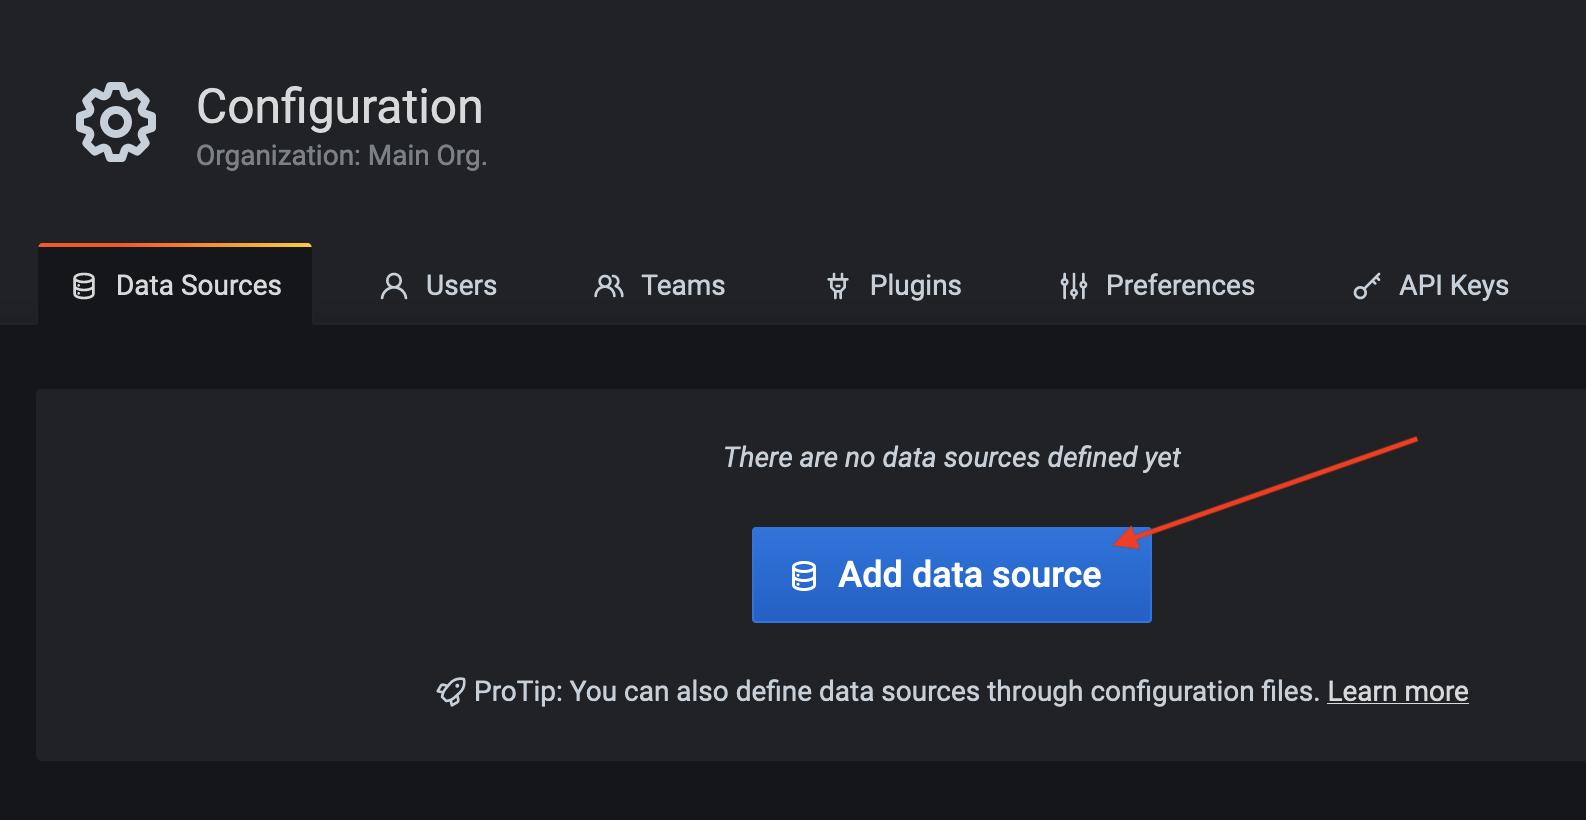 Click add data source